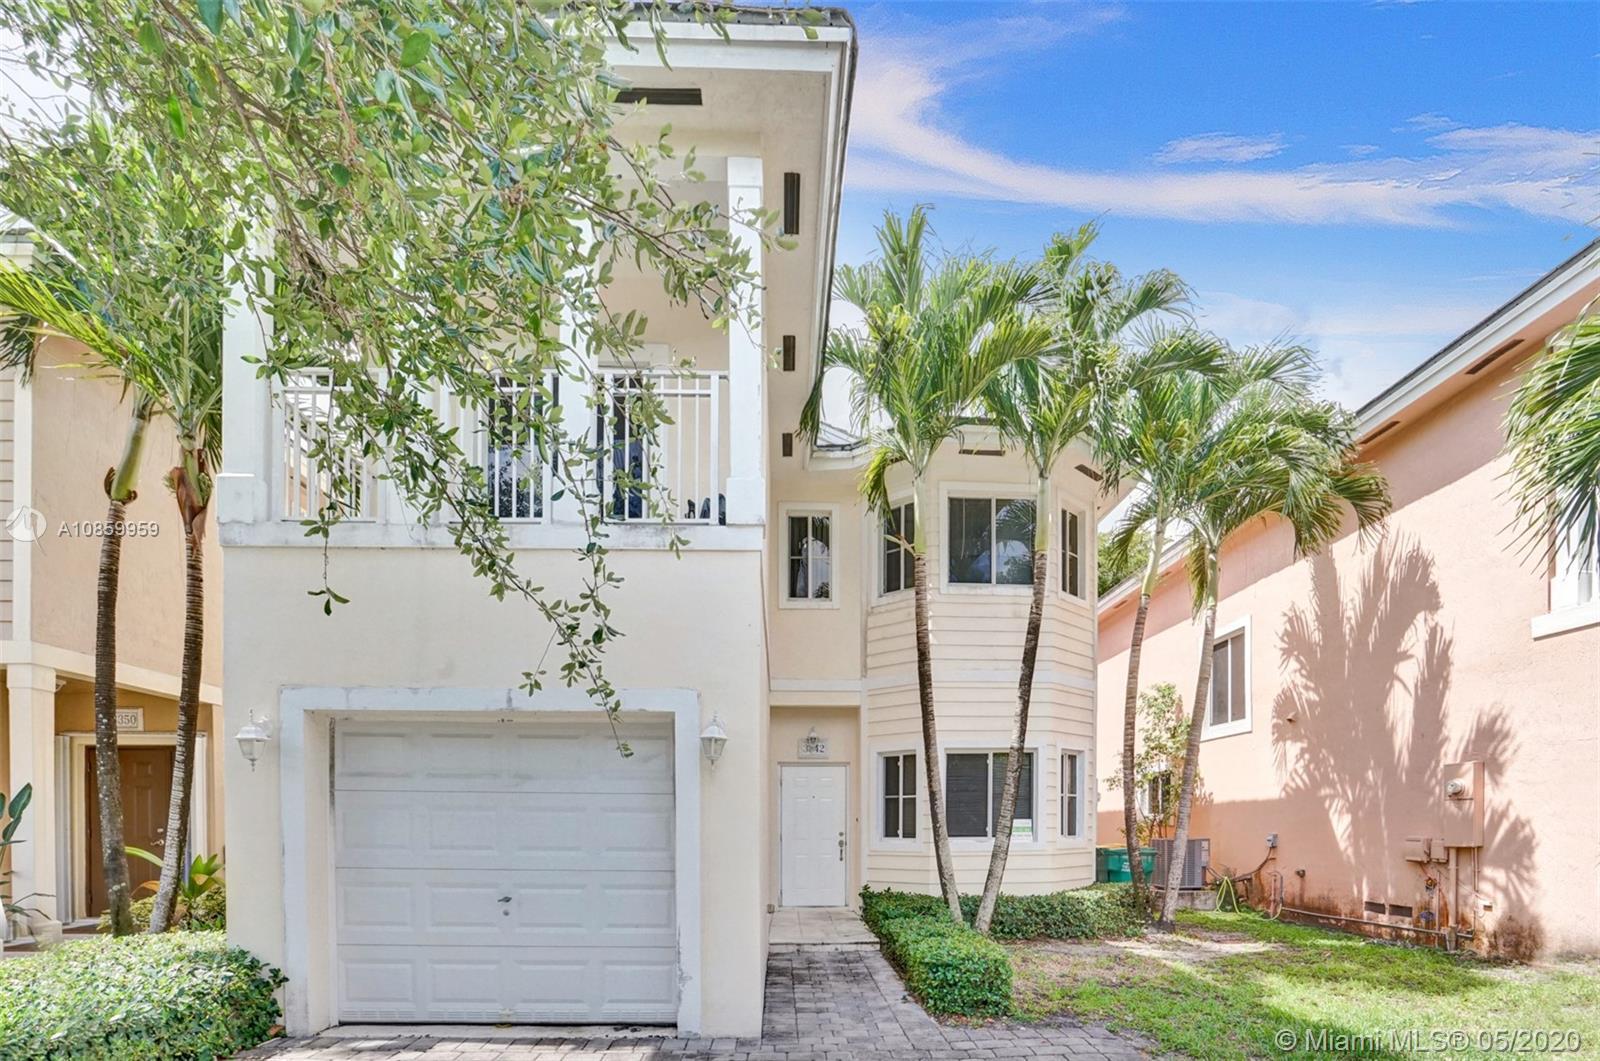 3342 NE 3rd Dr, Homestead, FL 33033 - Homestead, FL real estate listing